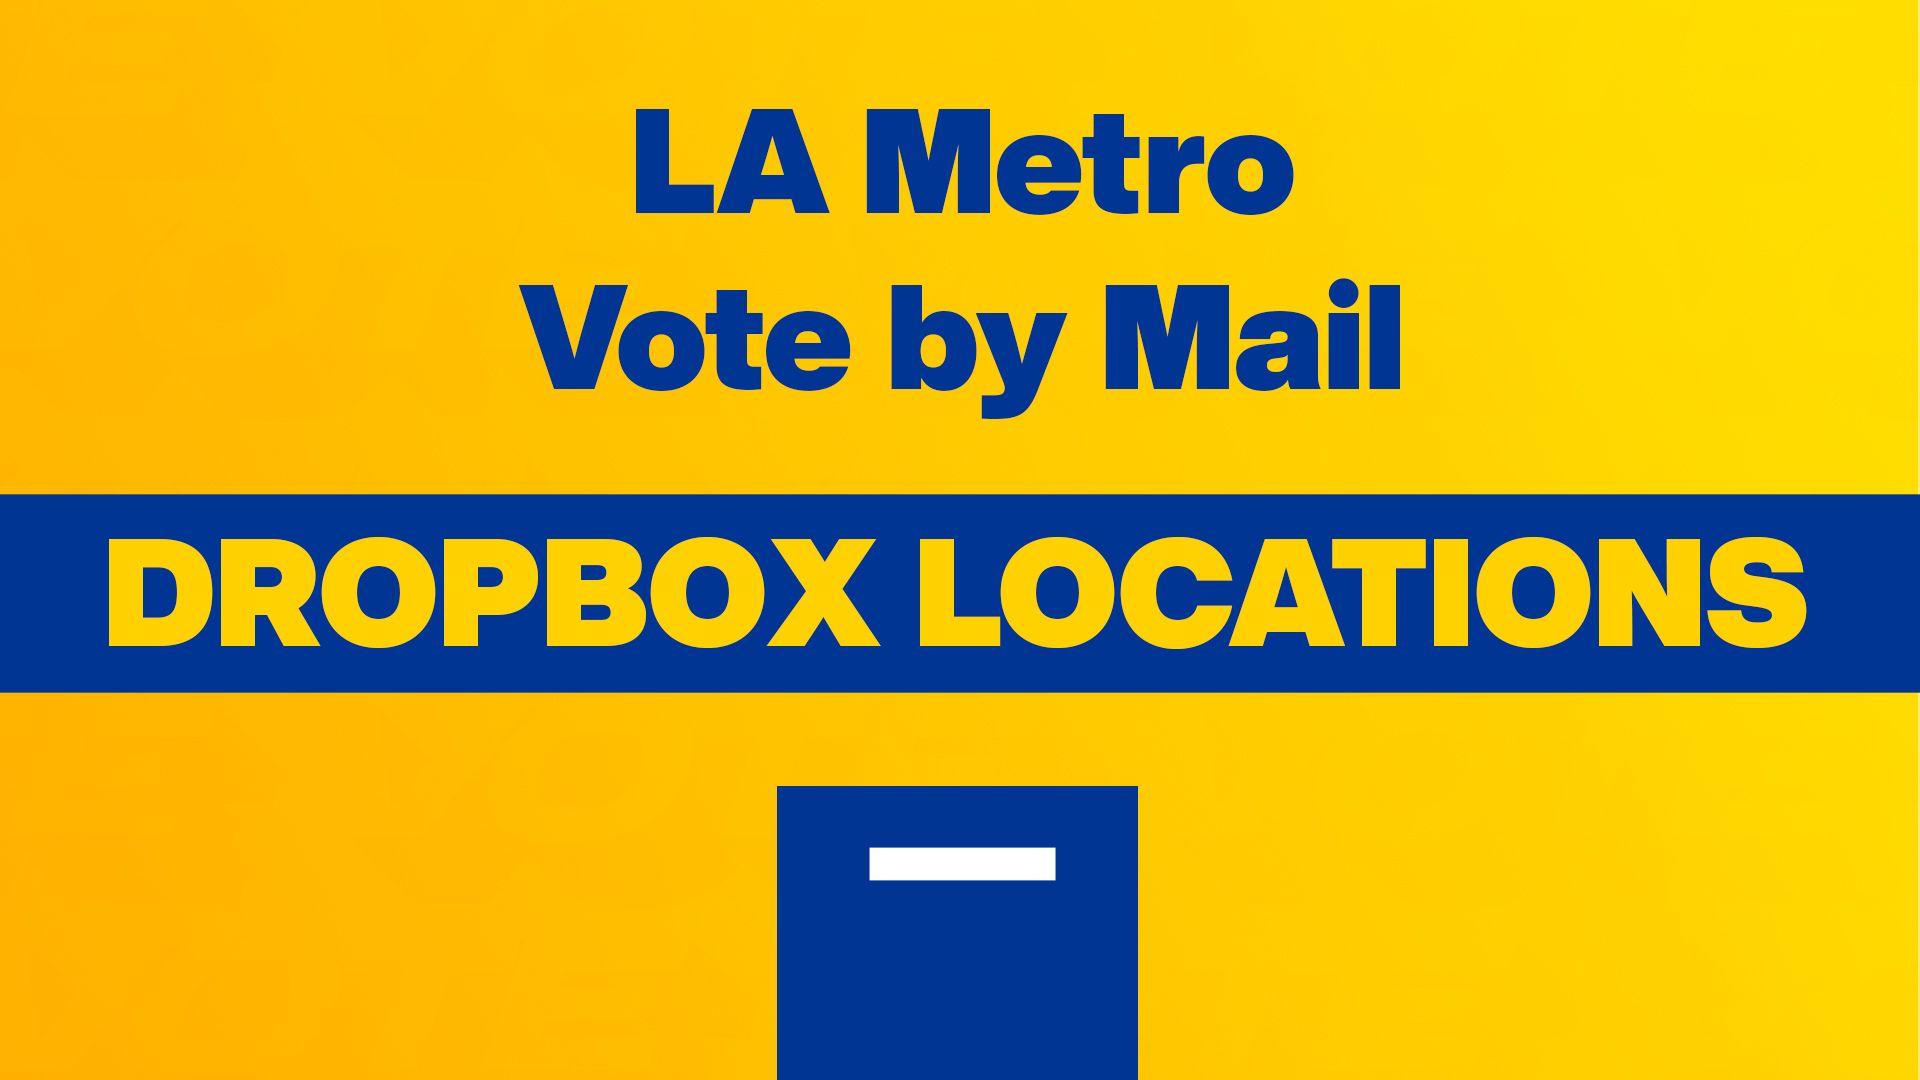 dropbox-locations-rtv-page